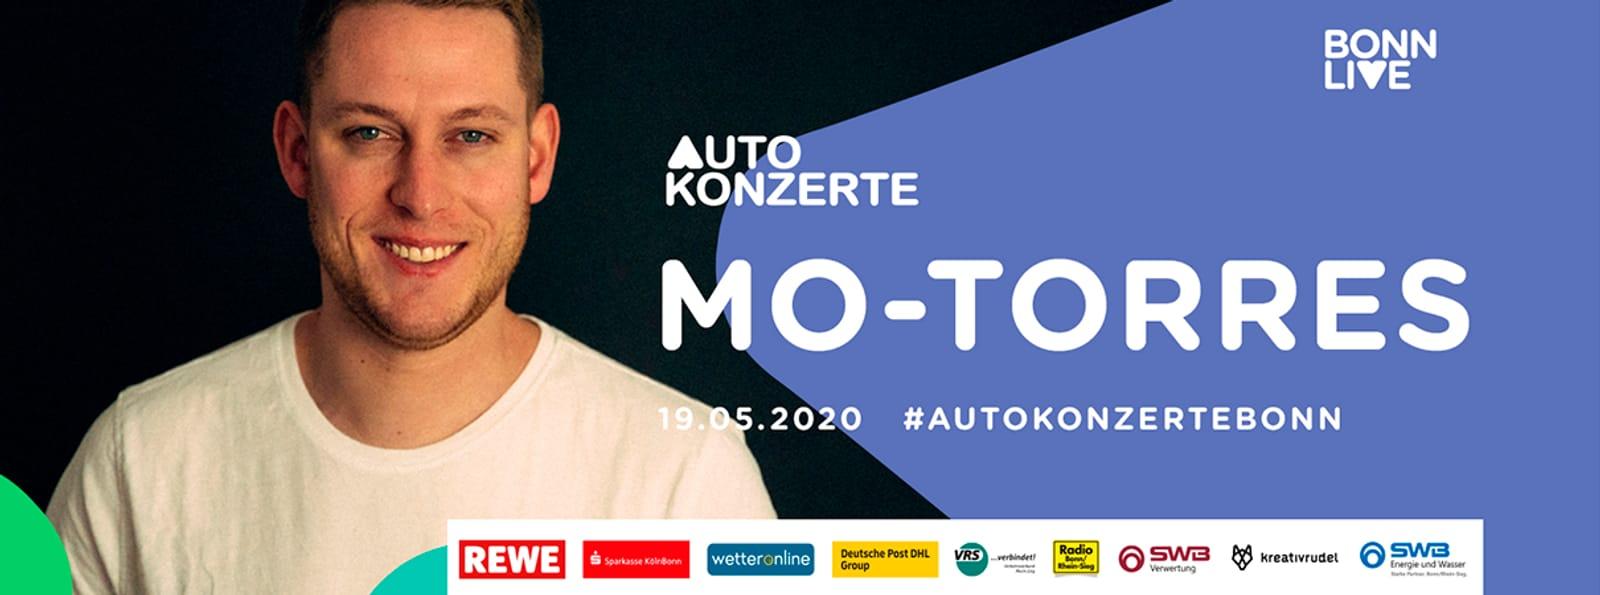 Mo-Torres | BonnLive Autokonzerte